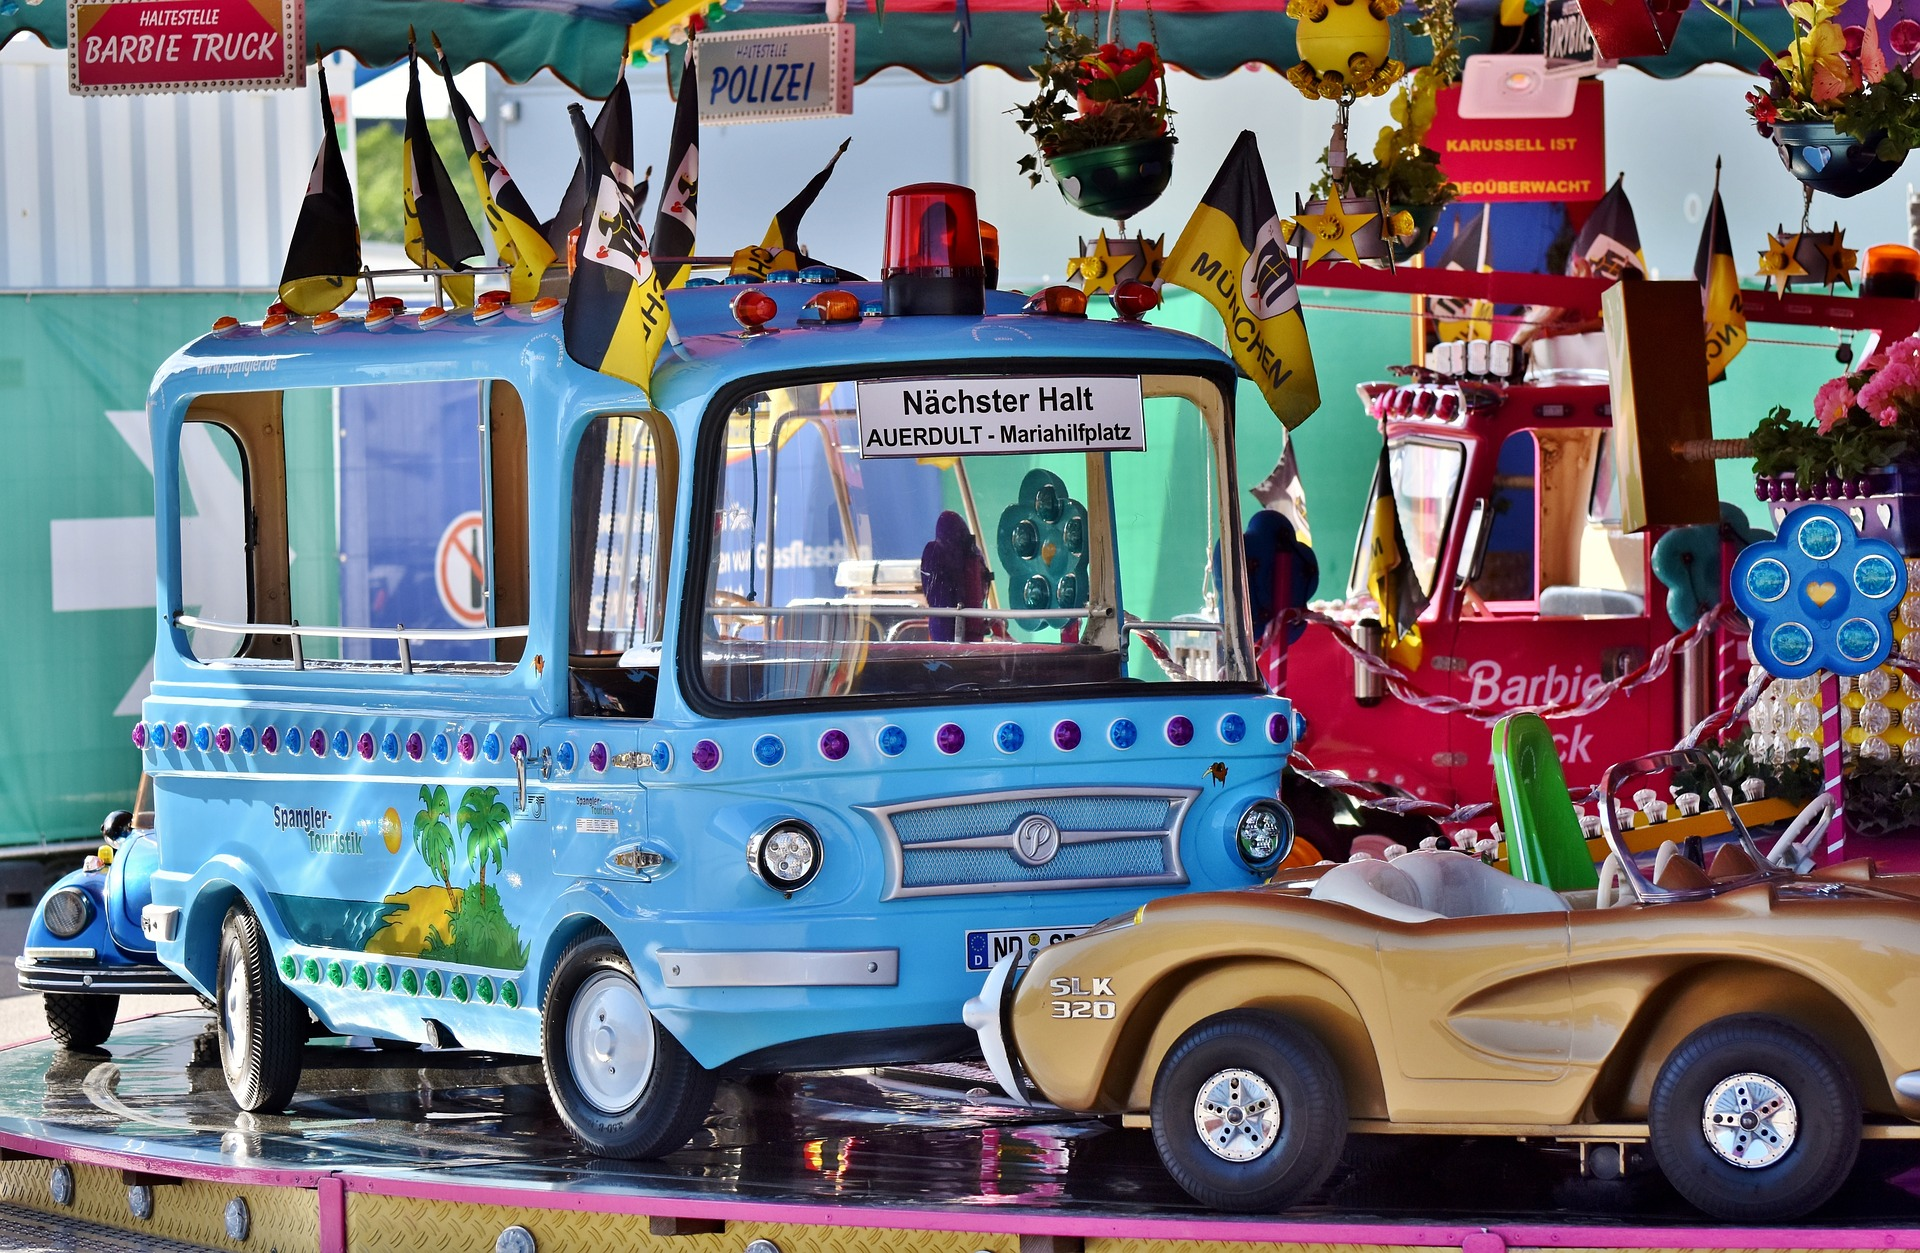 Kinderkarusell auf dem Volksfest -- Bild: Capri23auto / Pixabay